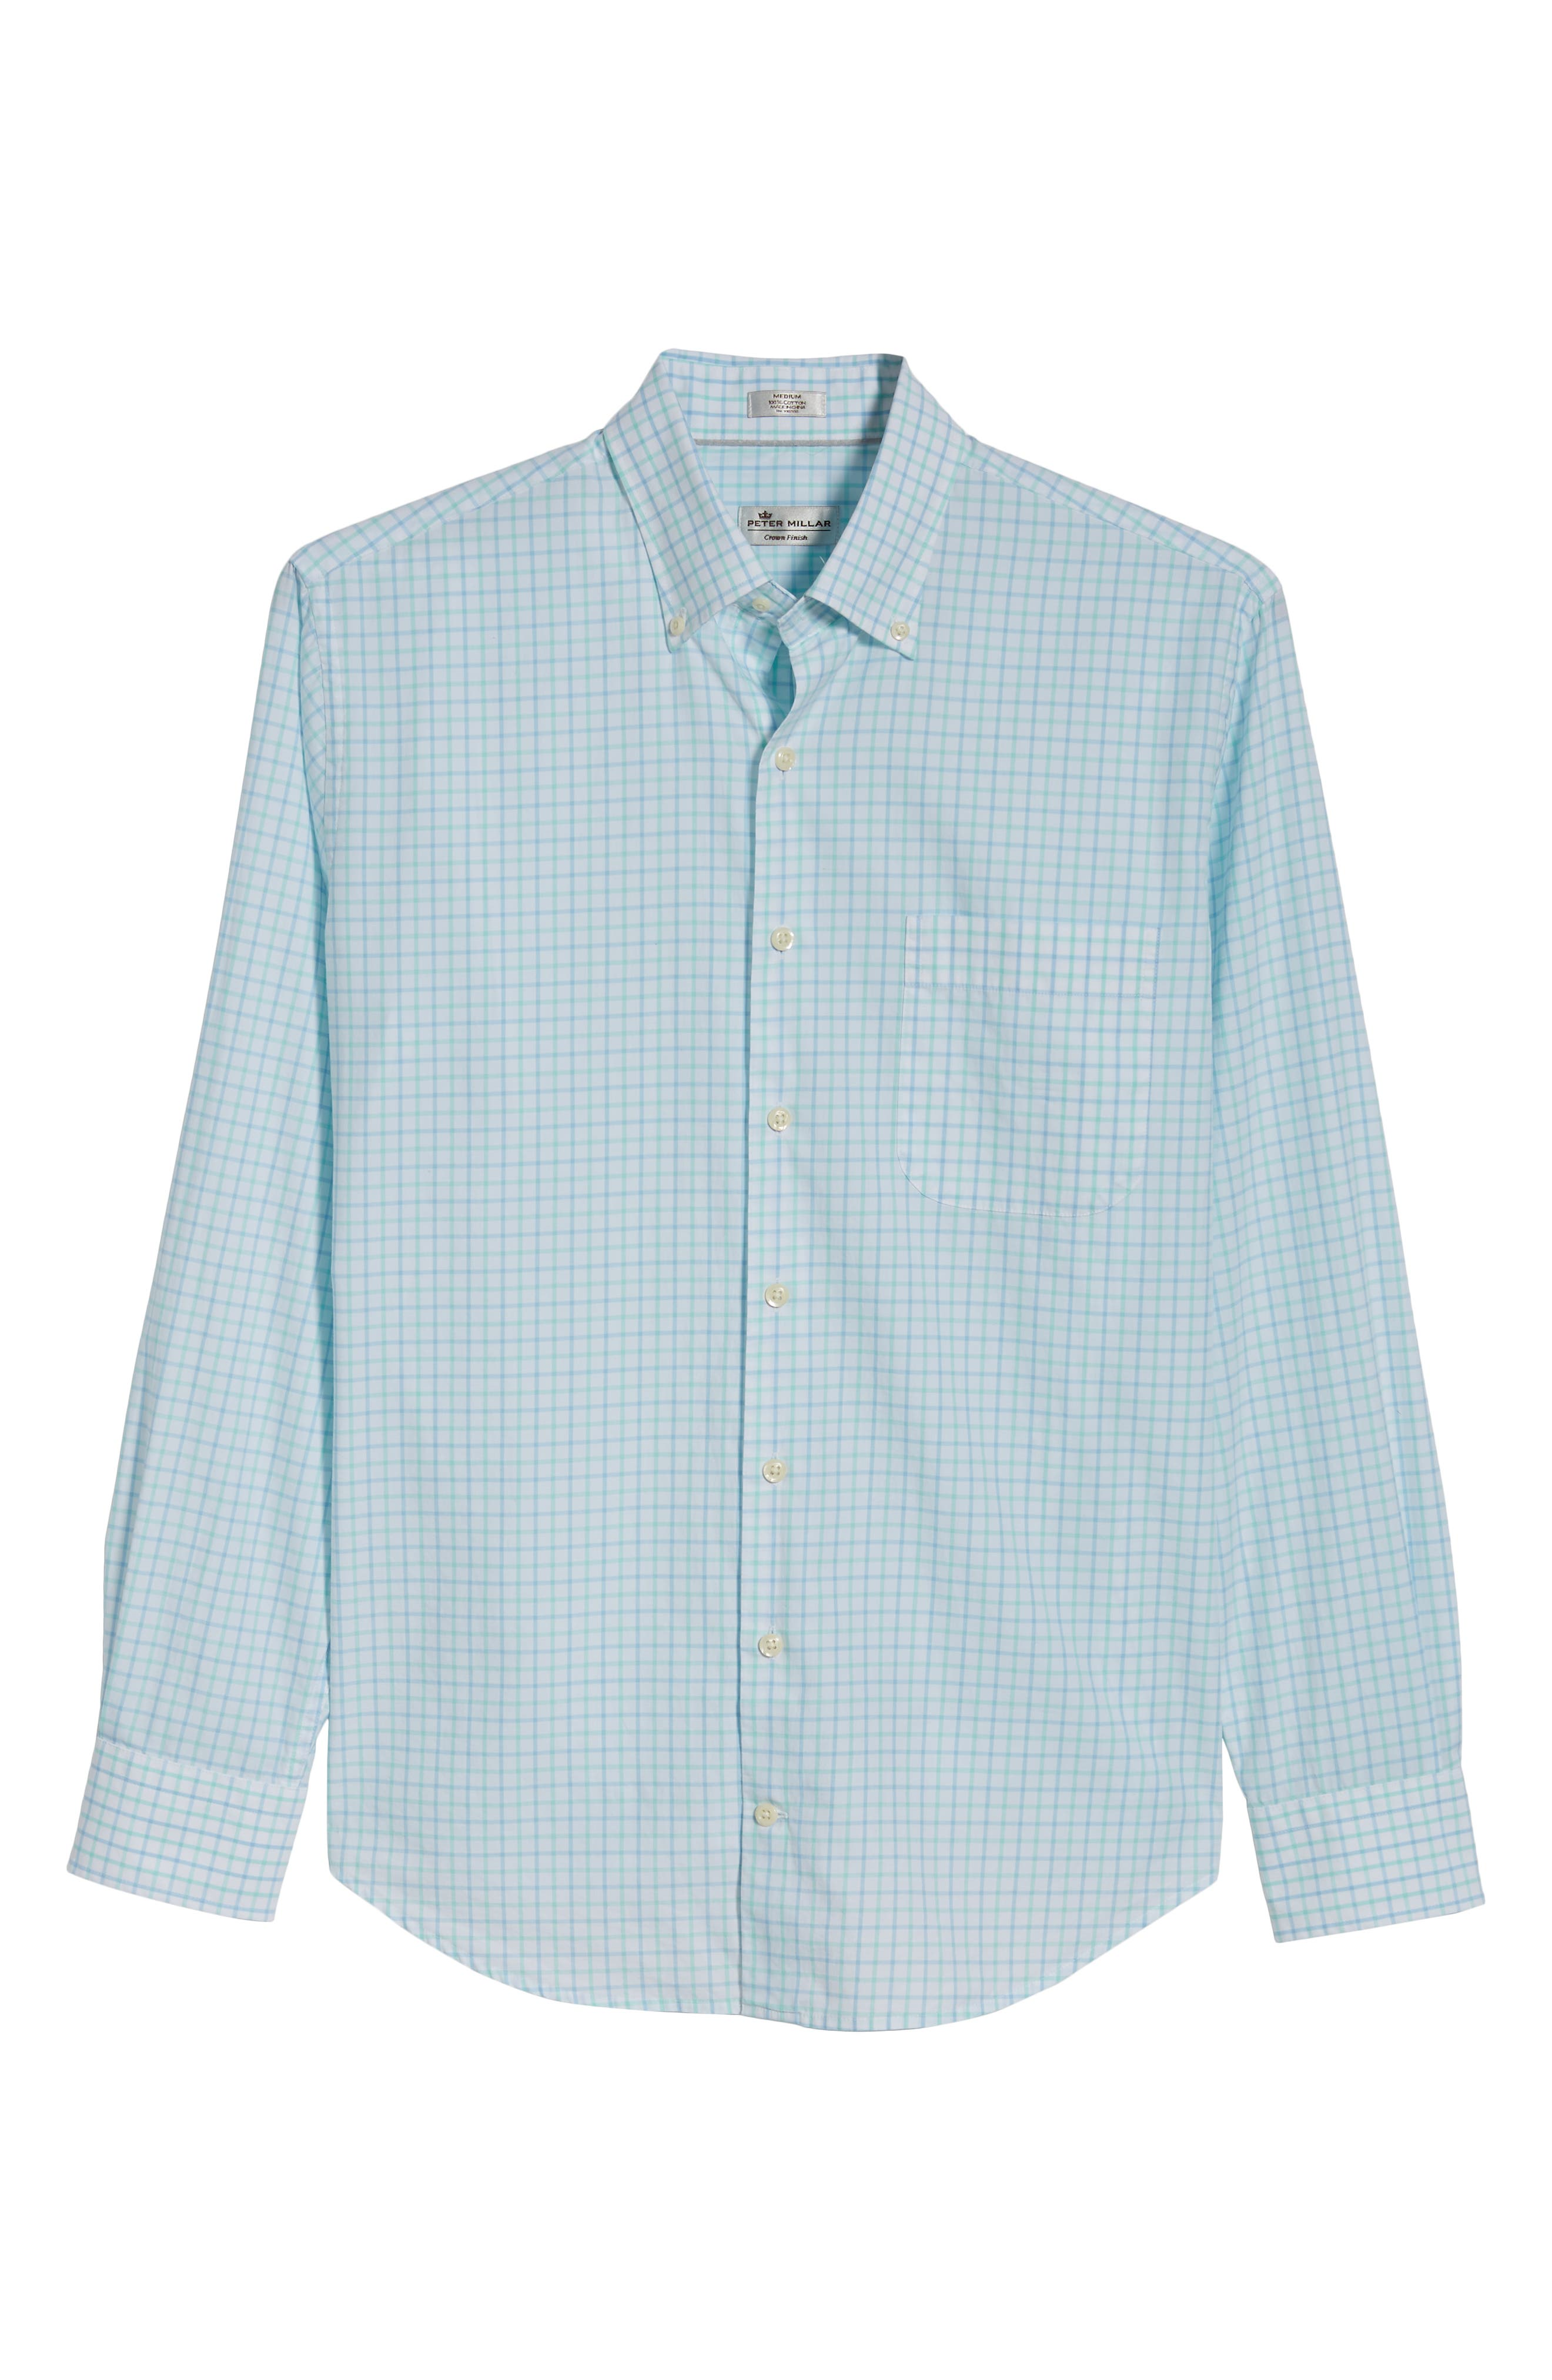 Crown Finish Wetland Tattersall Sport Shirt,                             Alternate thumbnail 6, color,                             Tar Heel Blue